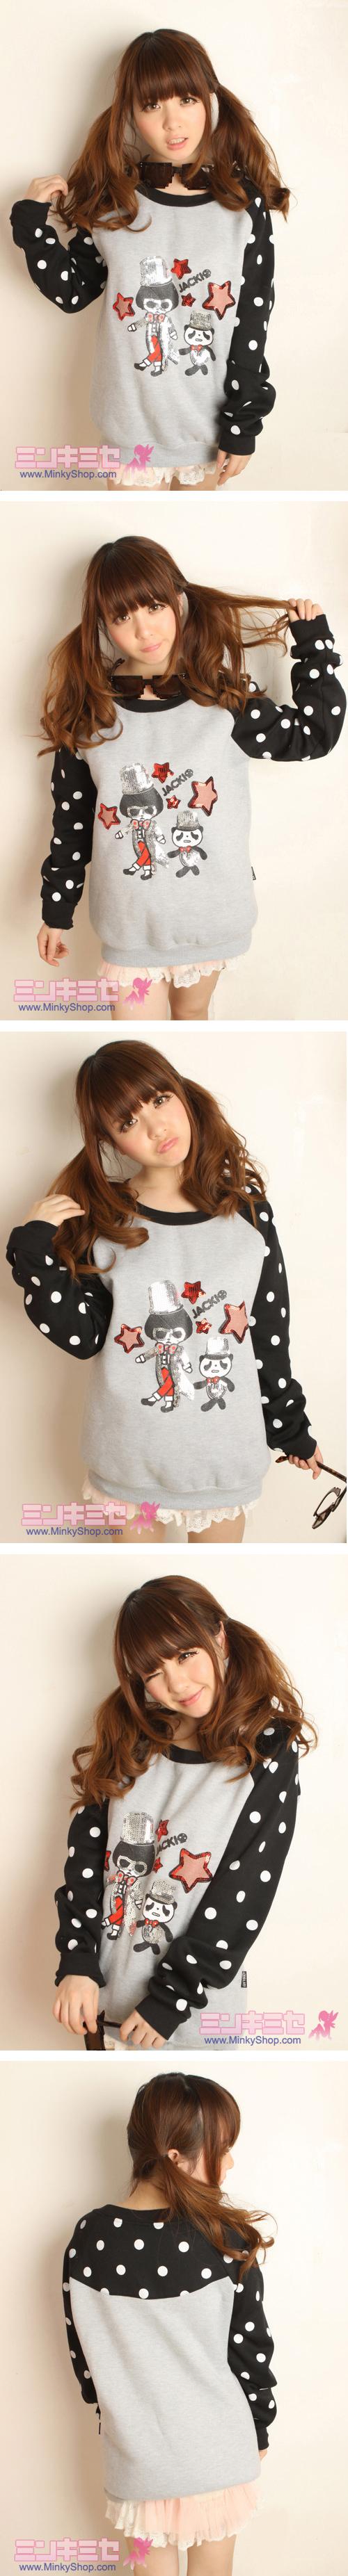 Cute Polka Dot Sequins Sweater